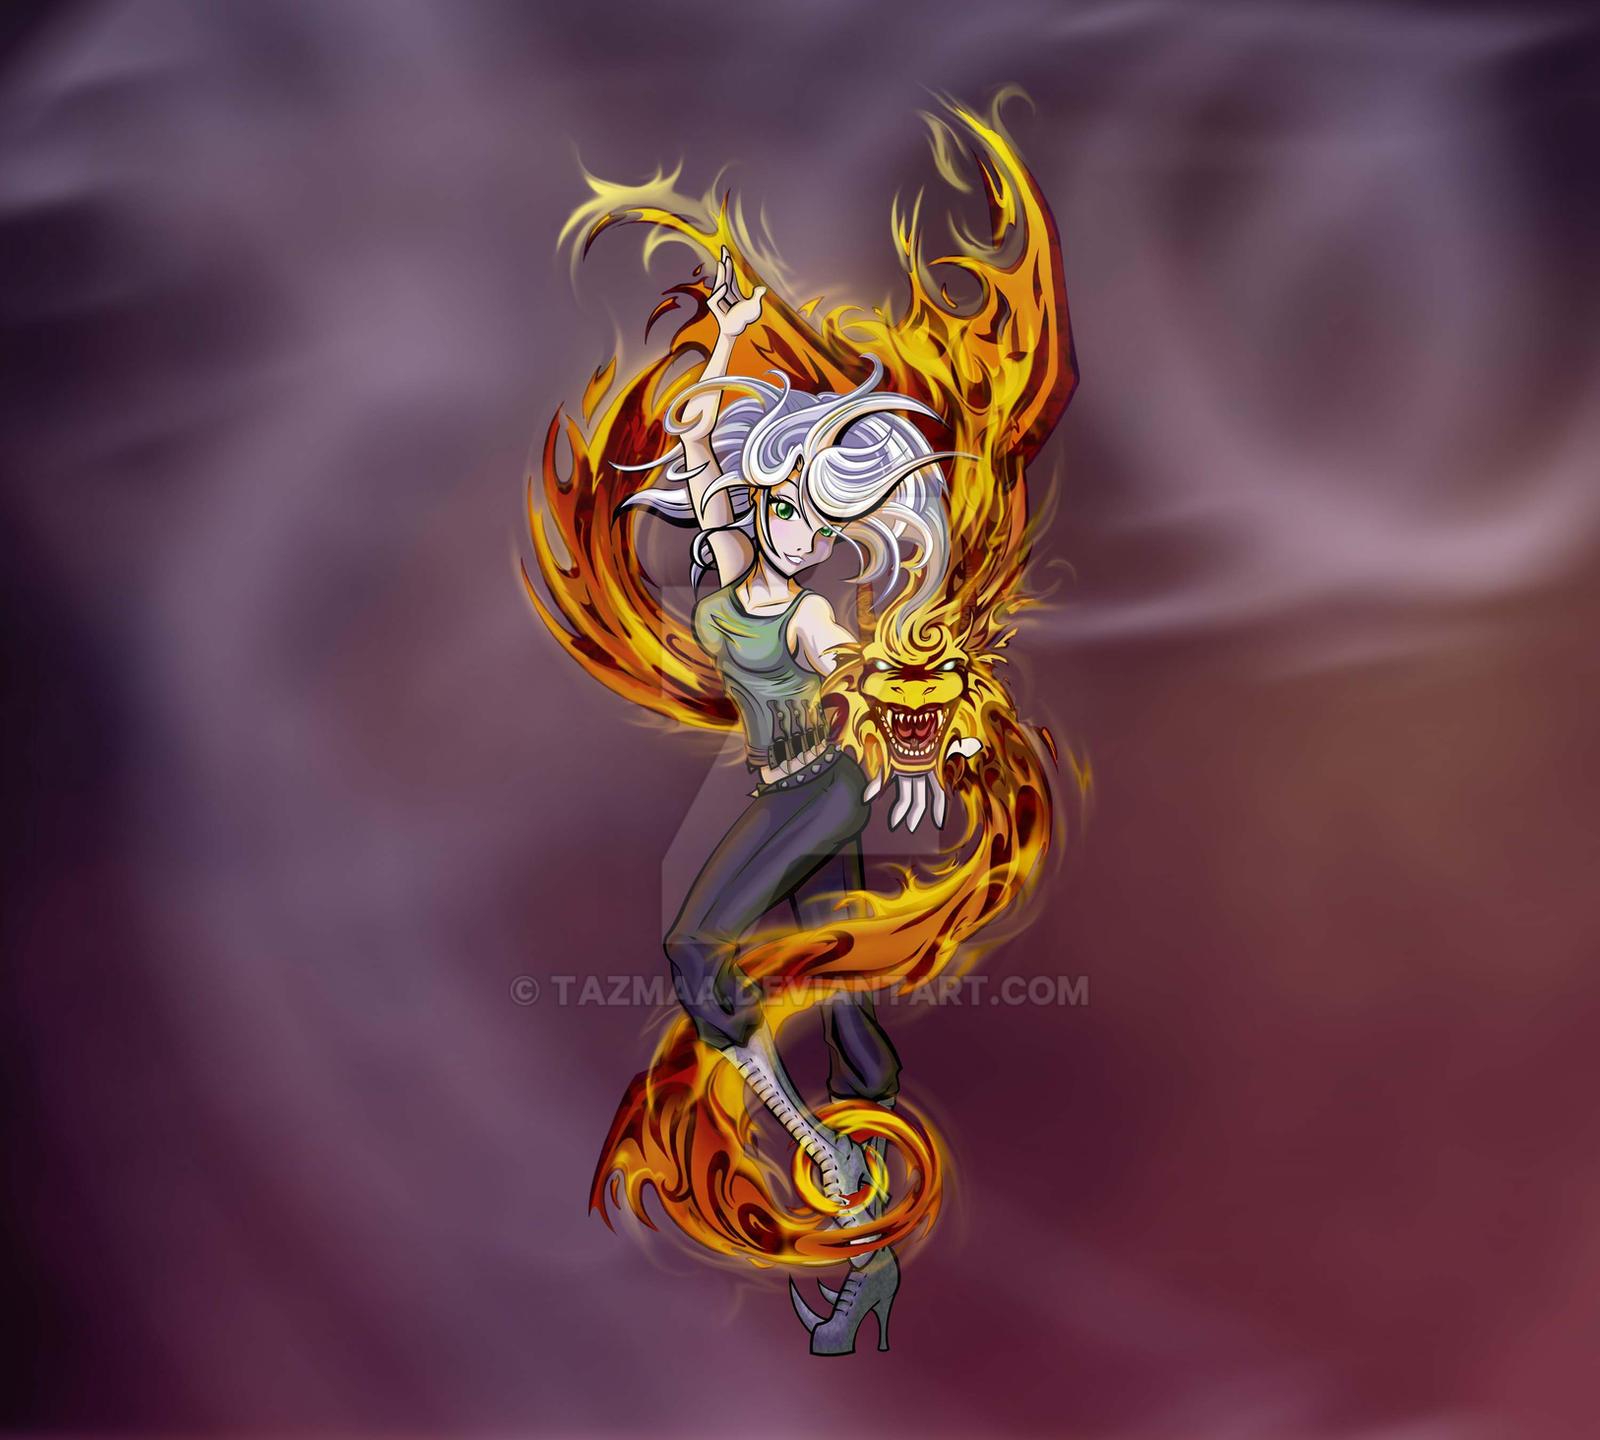 Fantasy Fire Dragon by Tazmaa